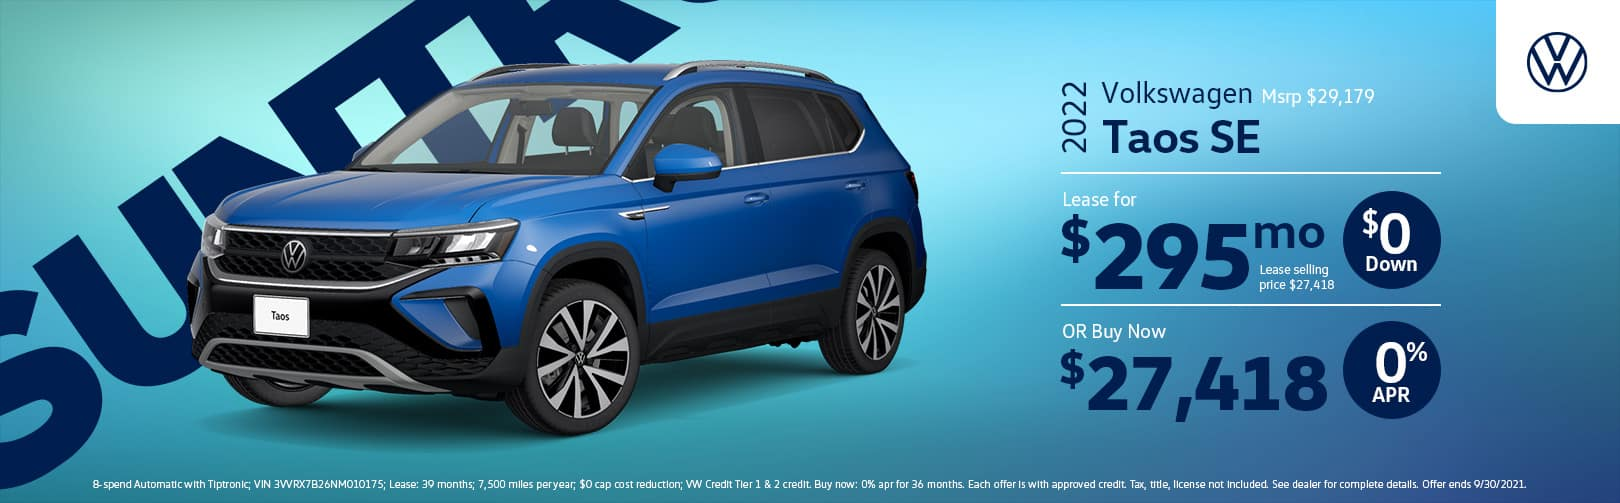 SVW-SEPT21-Banners-(2022-Volkswagen-Taos-SE)